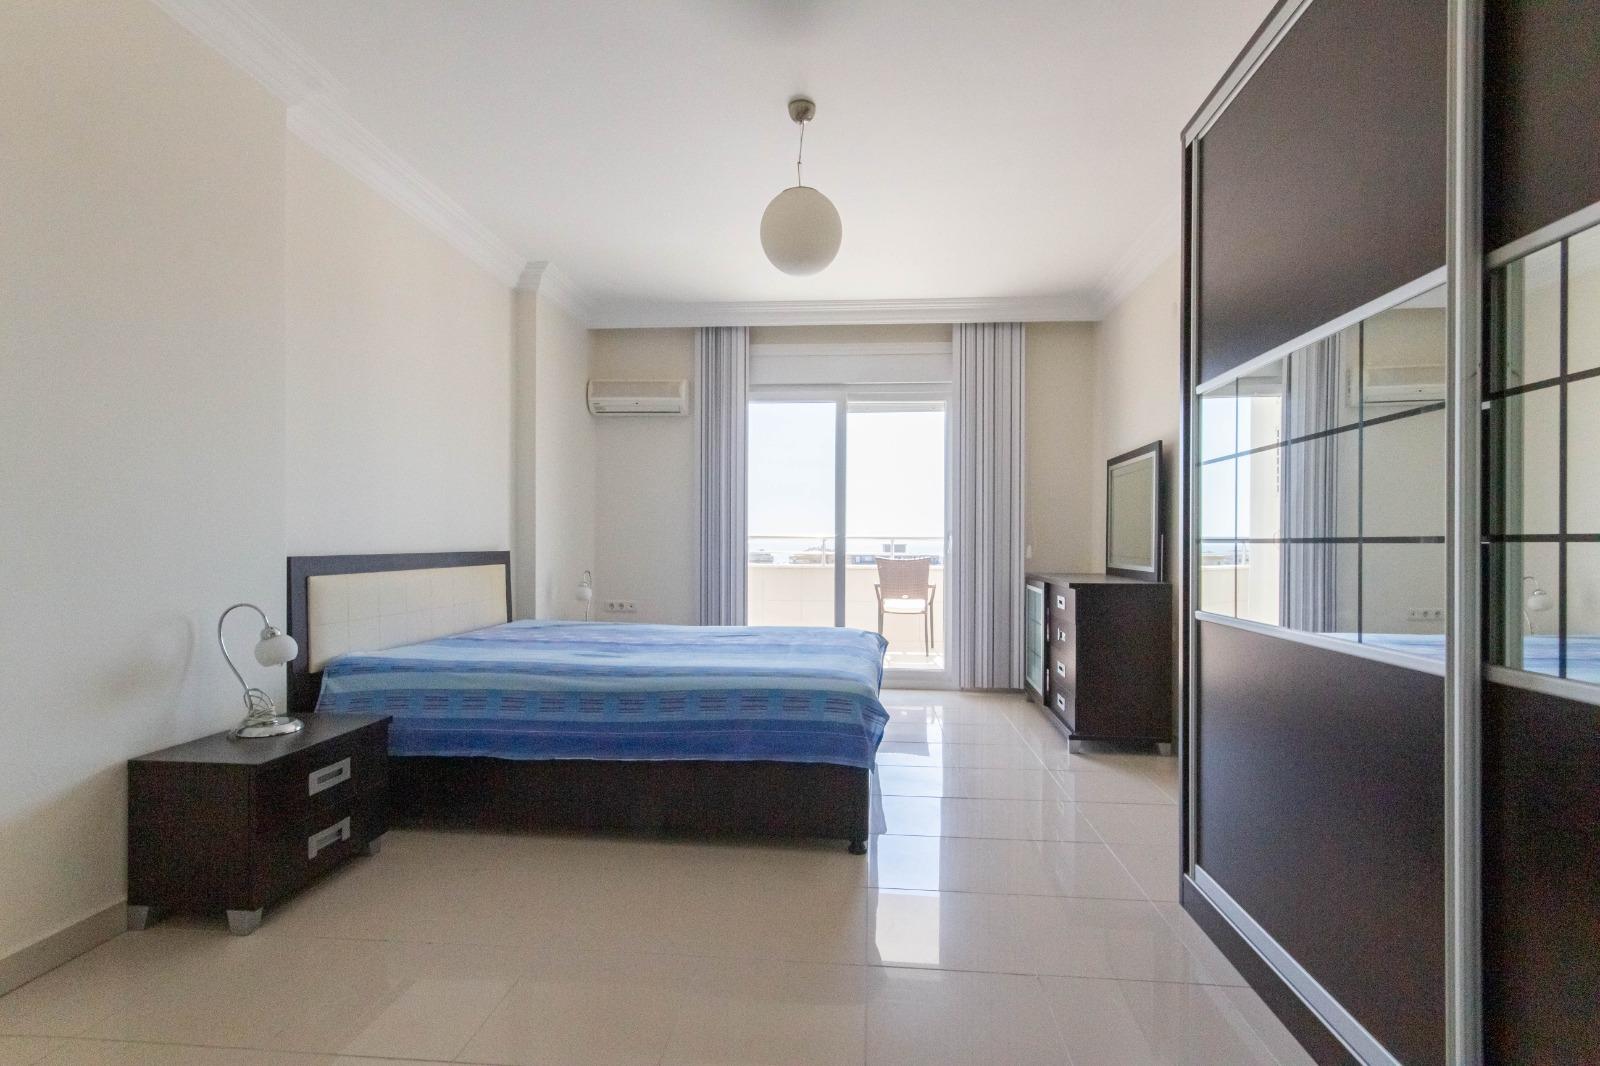 Меблированная квартира 2+1 с видом на море. - Фото 26